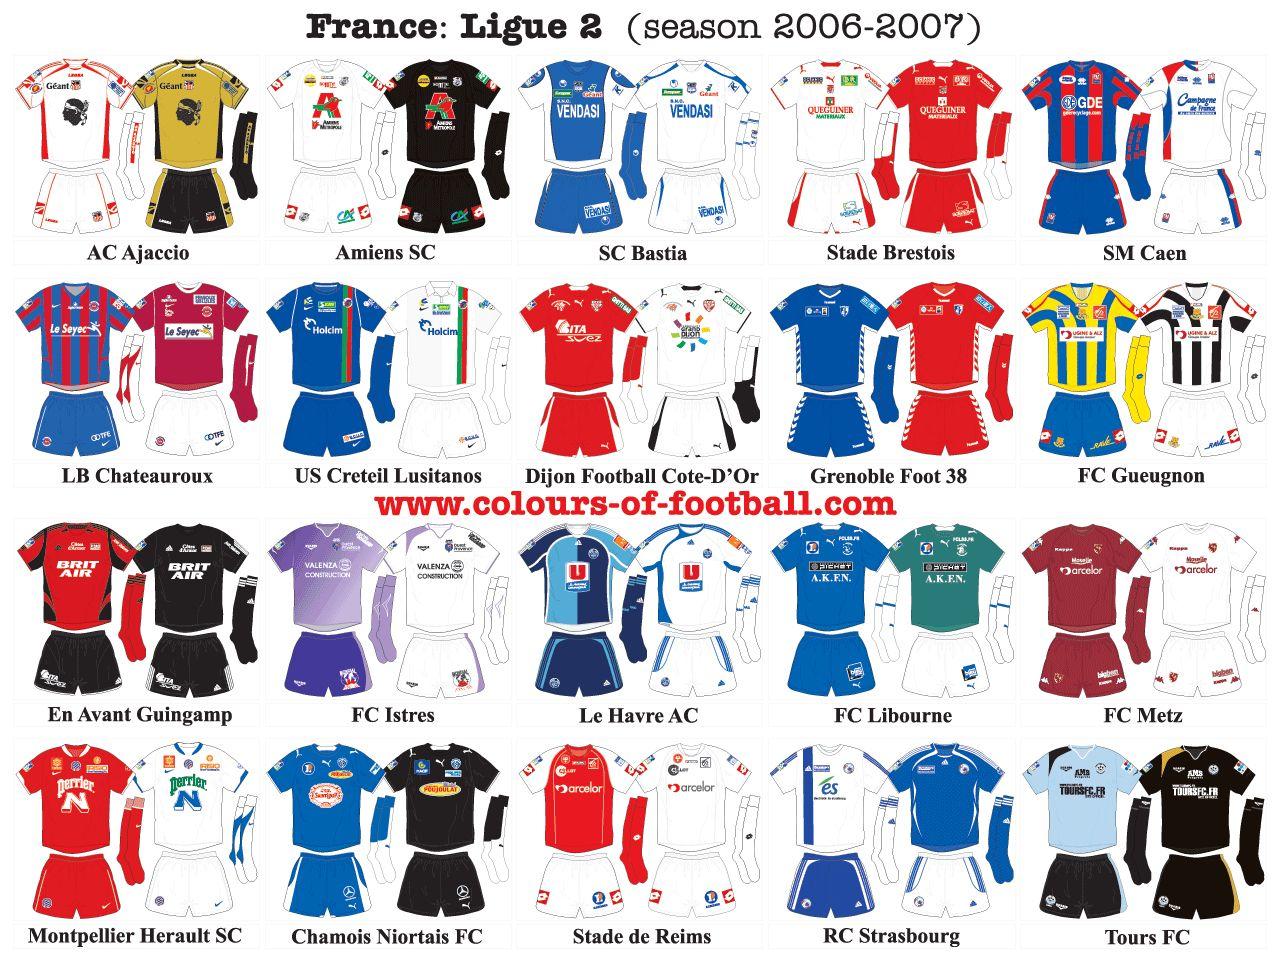 2006 07 French Ligue 2 Kits Hermes Oran Sandal Oran Football